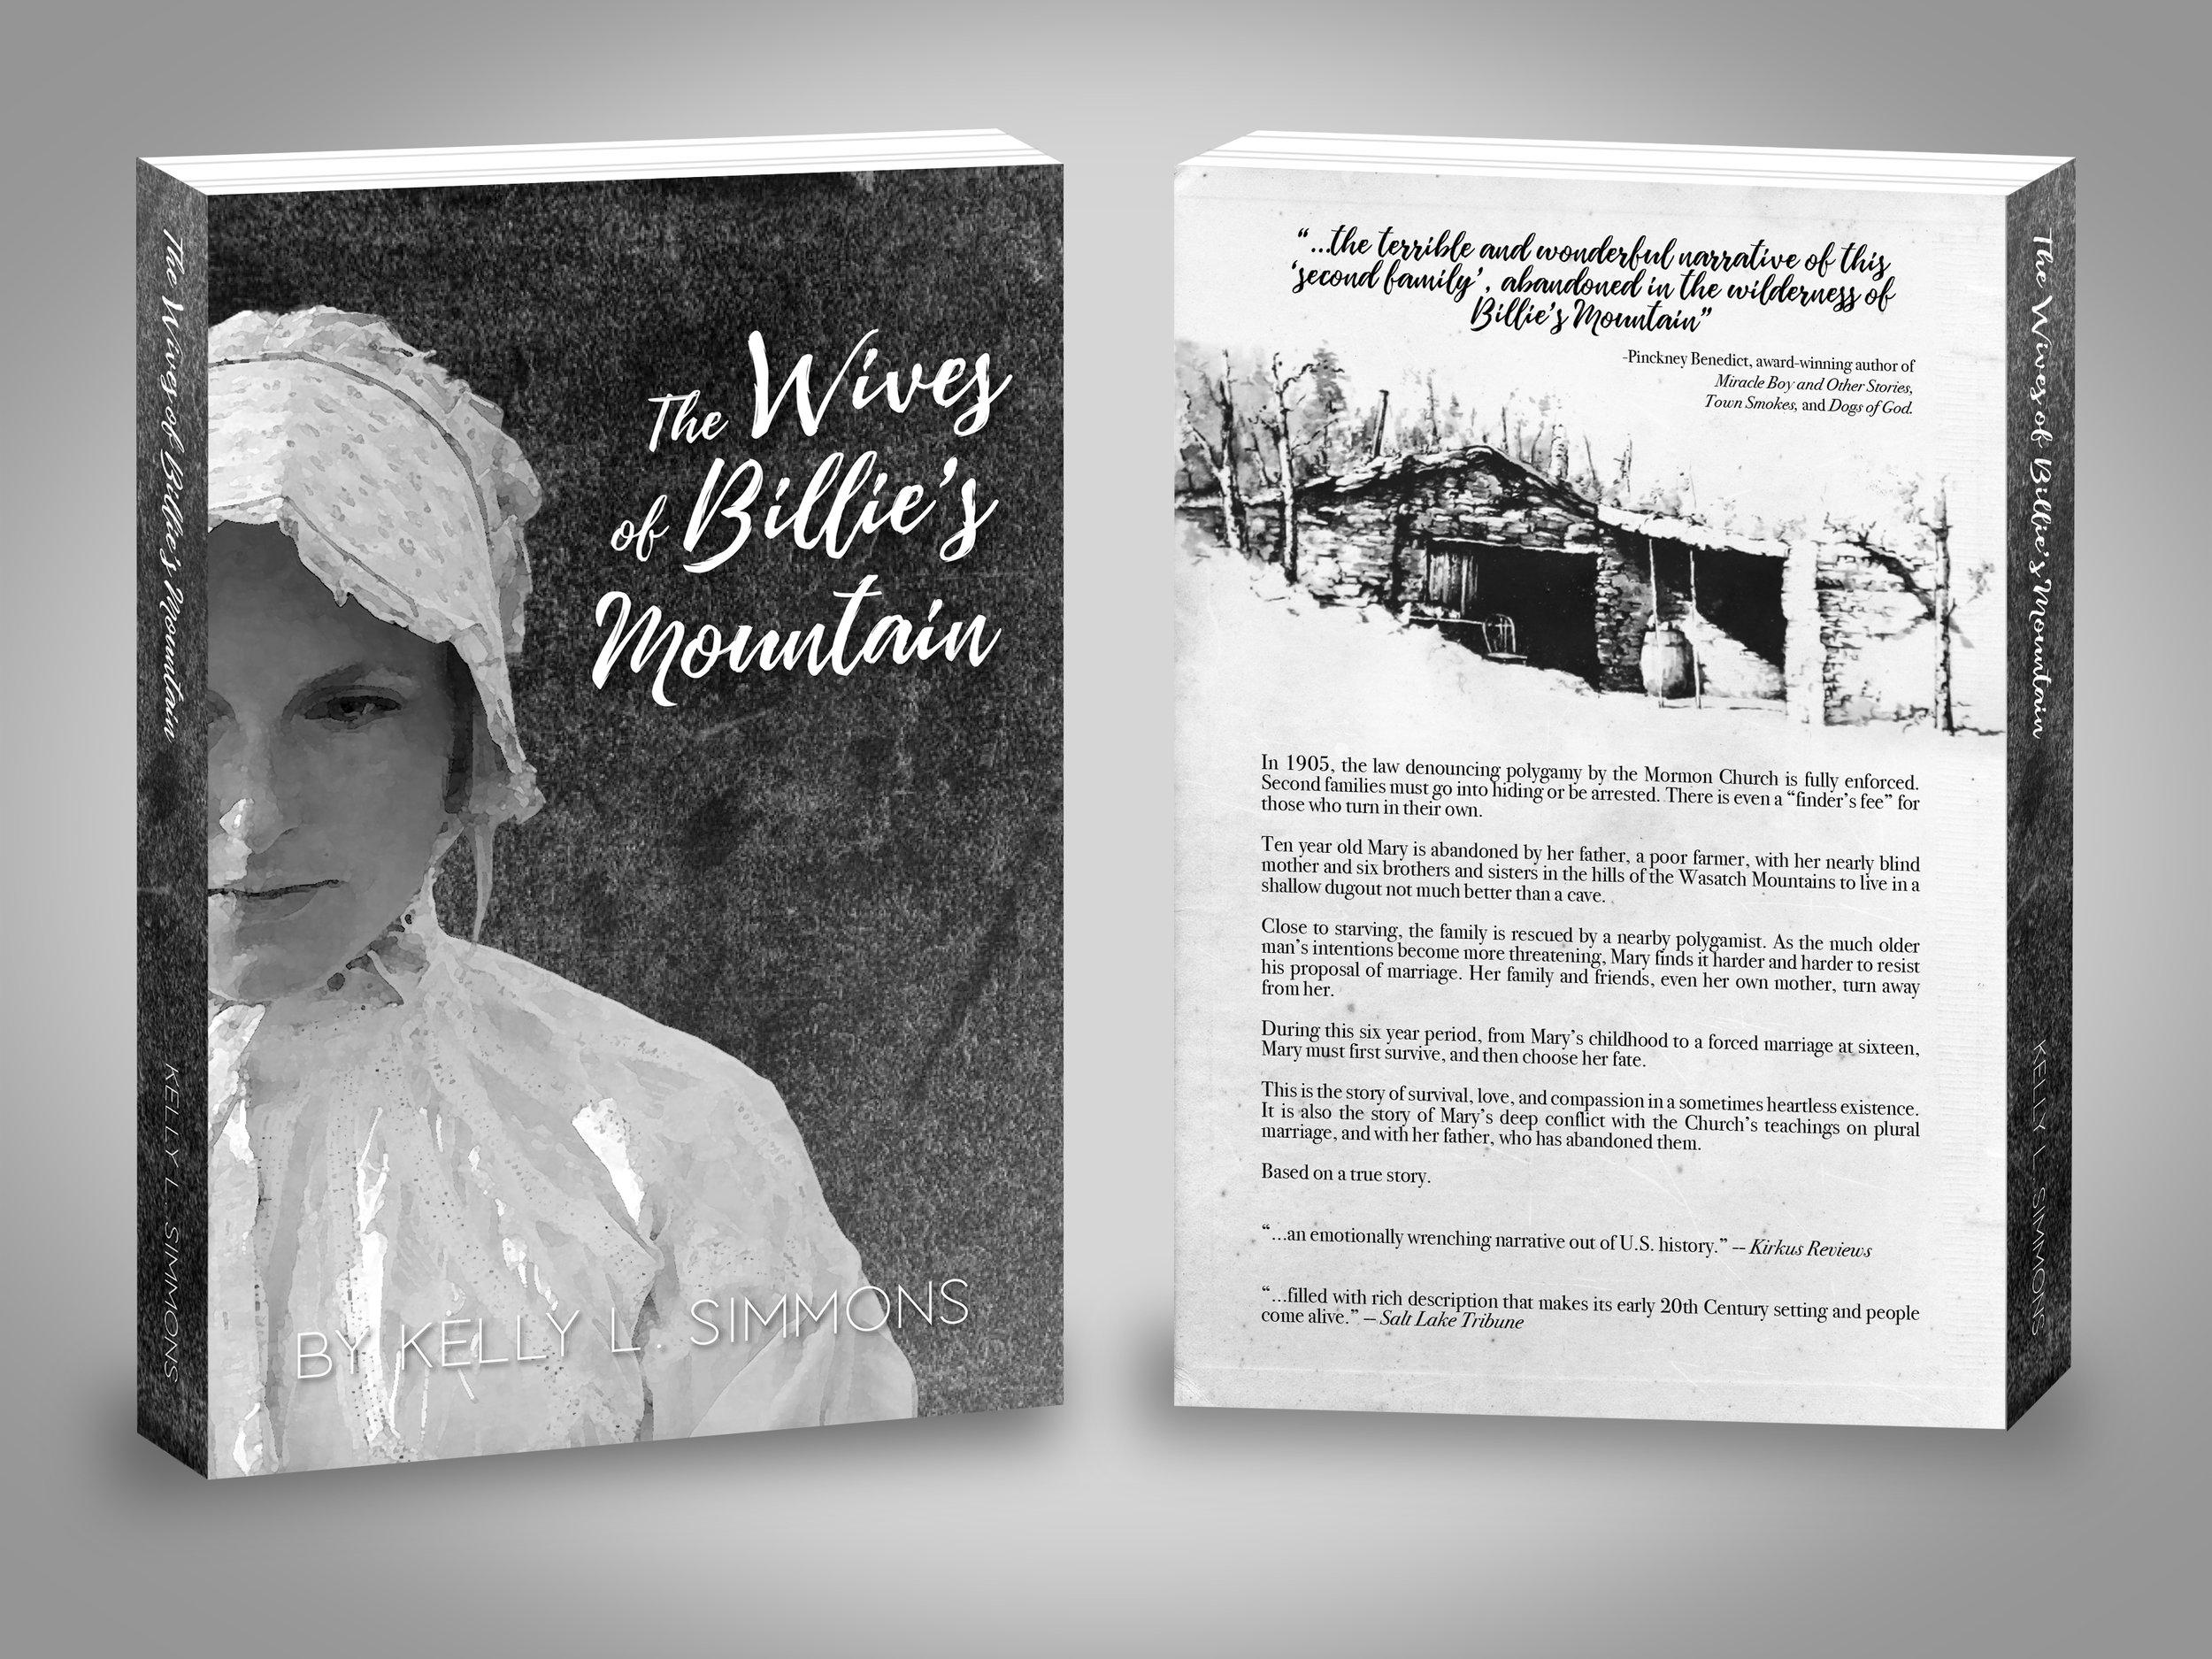 mormon, polygamy, polygamist, literature, fiction, novel, historical, history, turn of the century, women, woman, female, ex-mormom, exmormon, book cover